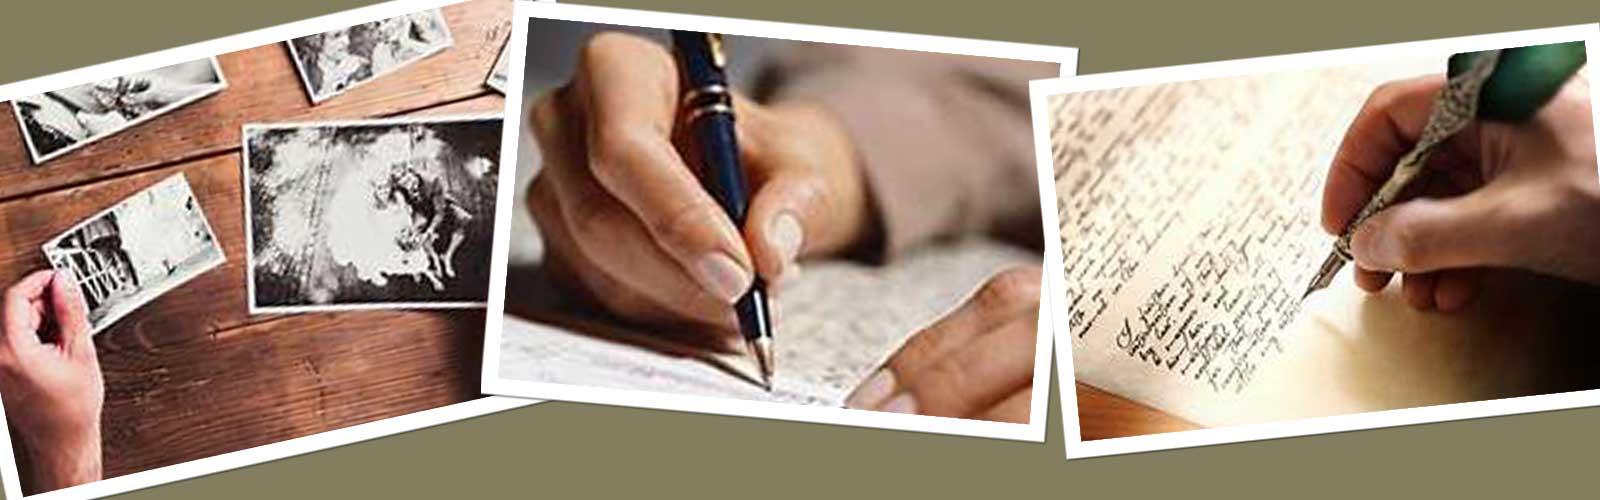 Entre Nós: a escrita afetiva